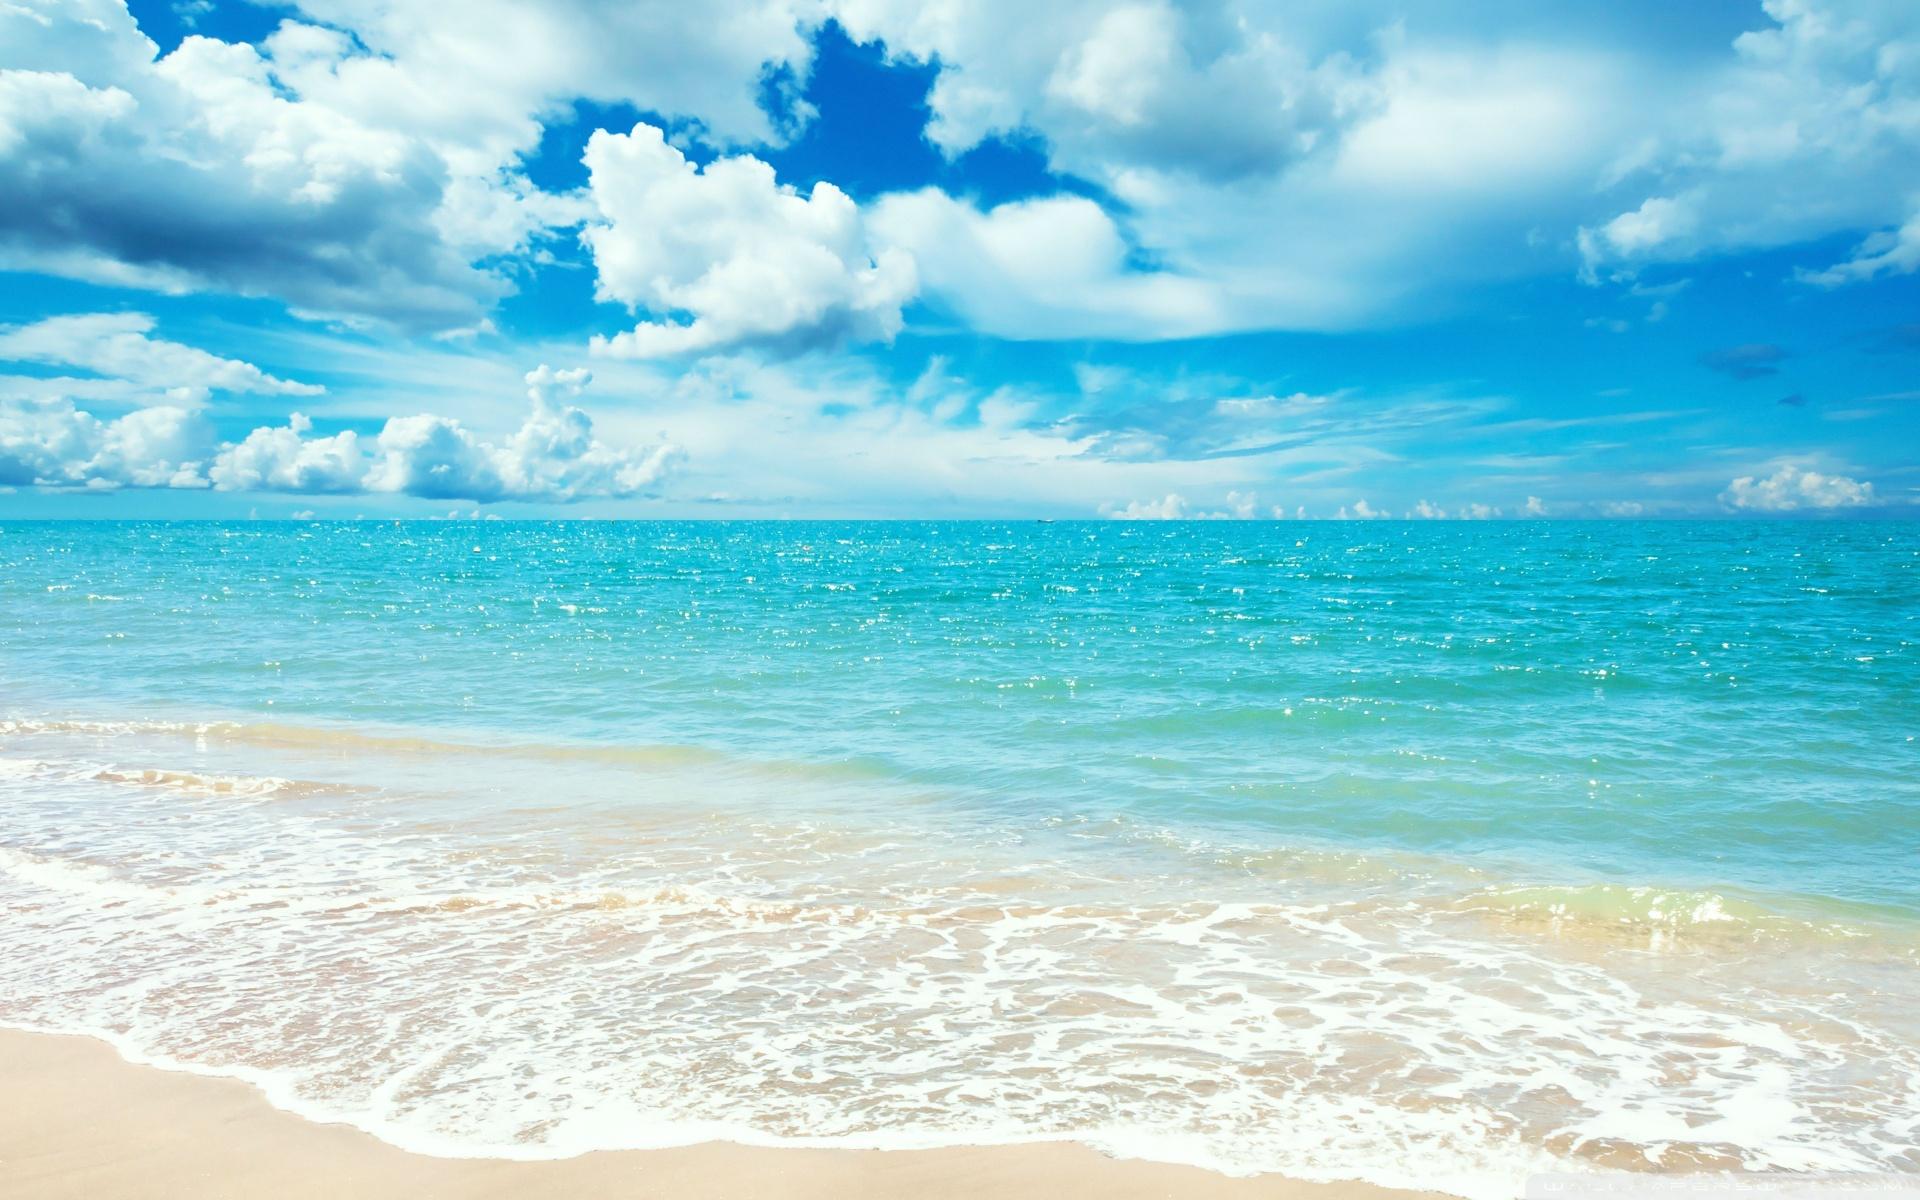 Beautiful Sunny Day Wallpaper 2438H82 Picserio   Picseriocom 1920x1200